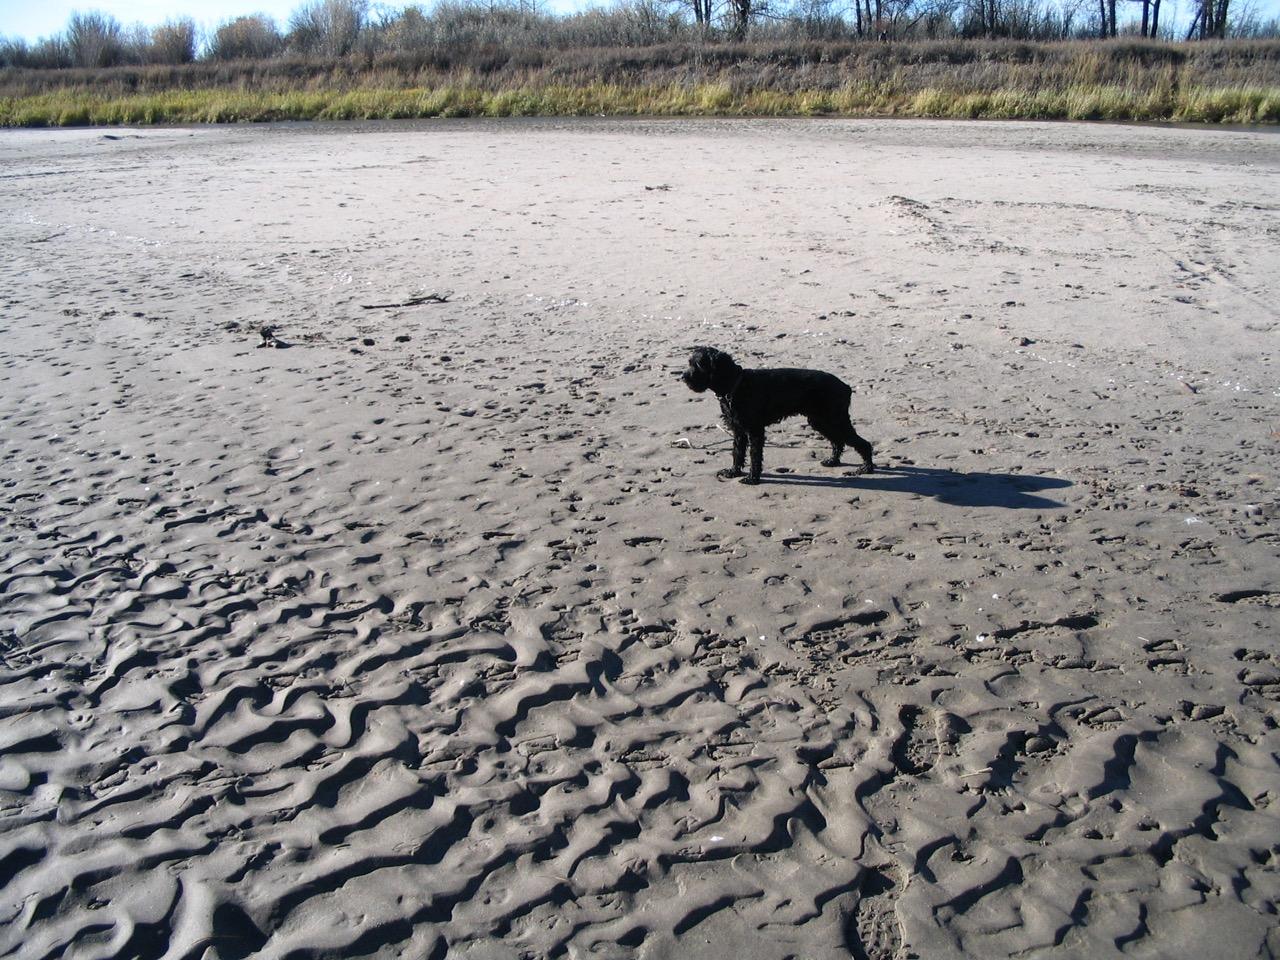 Sand ripples deposited by the South Saskatchewan River near Saskatoon, Saskatchewan, Canada [KP]